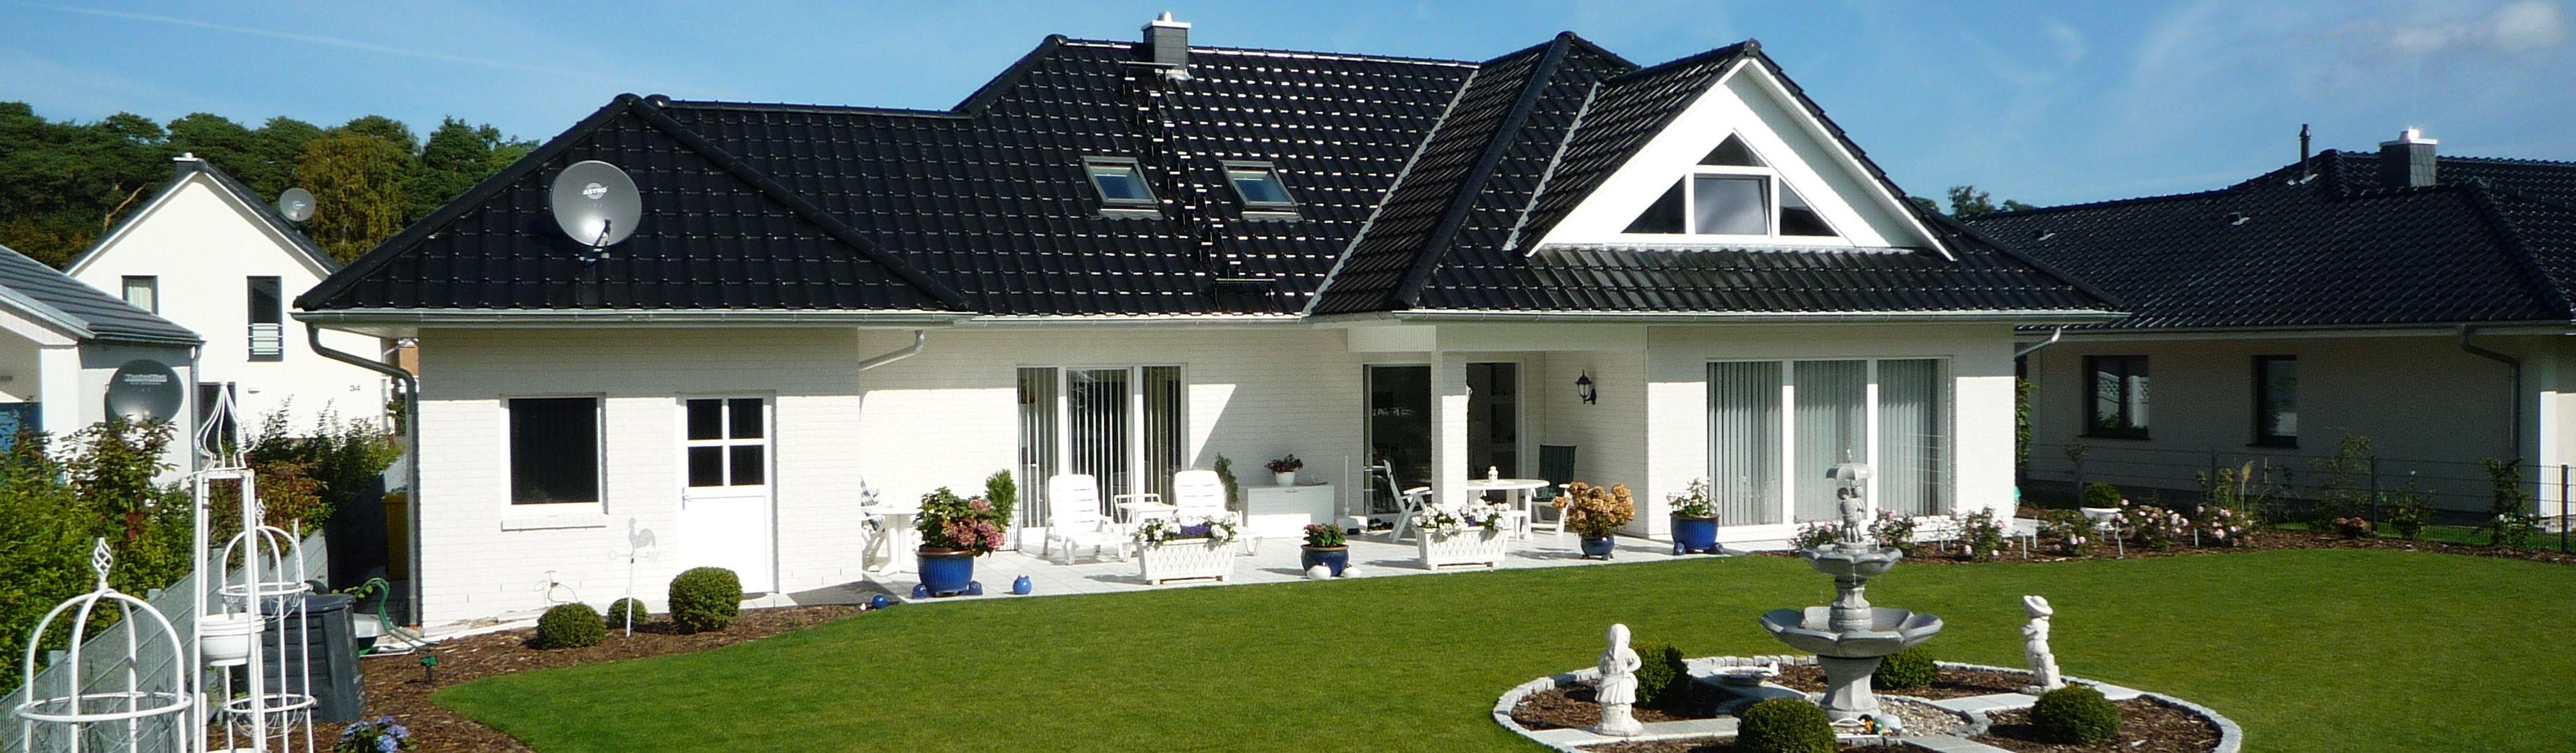 rostow bau bauunternehmen in berlin homify. Black Bedroom Furniture Sets. Home Design Ideas